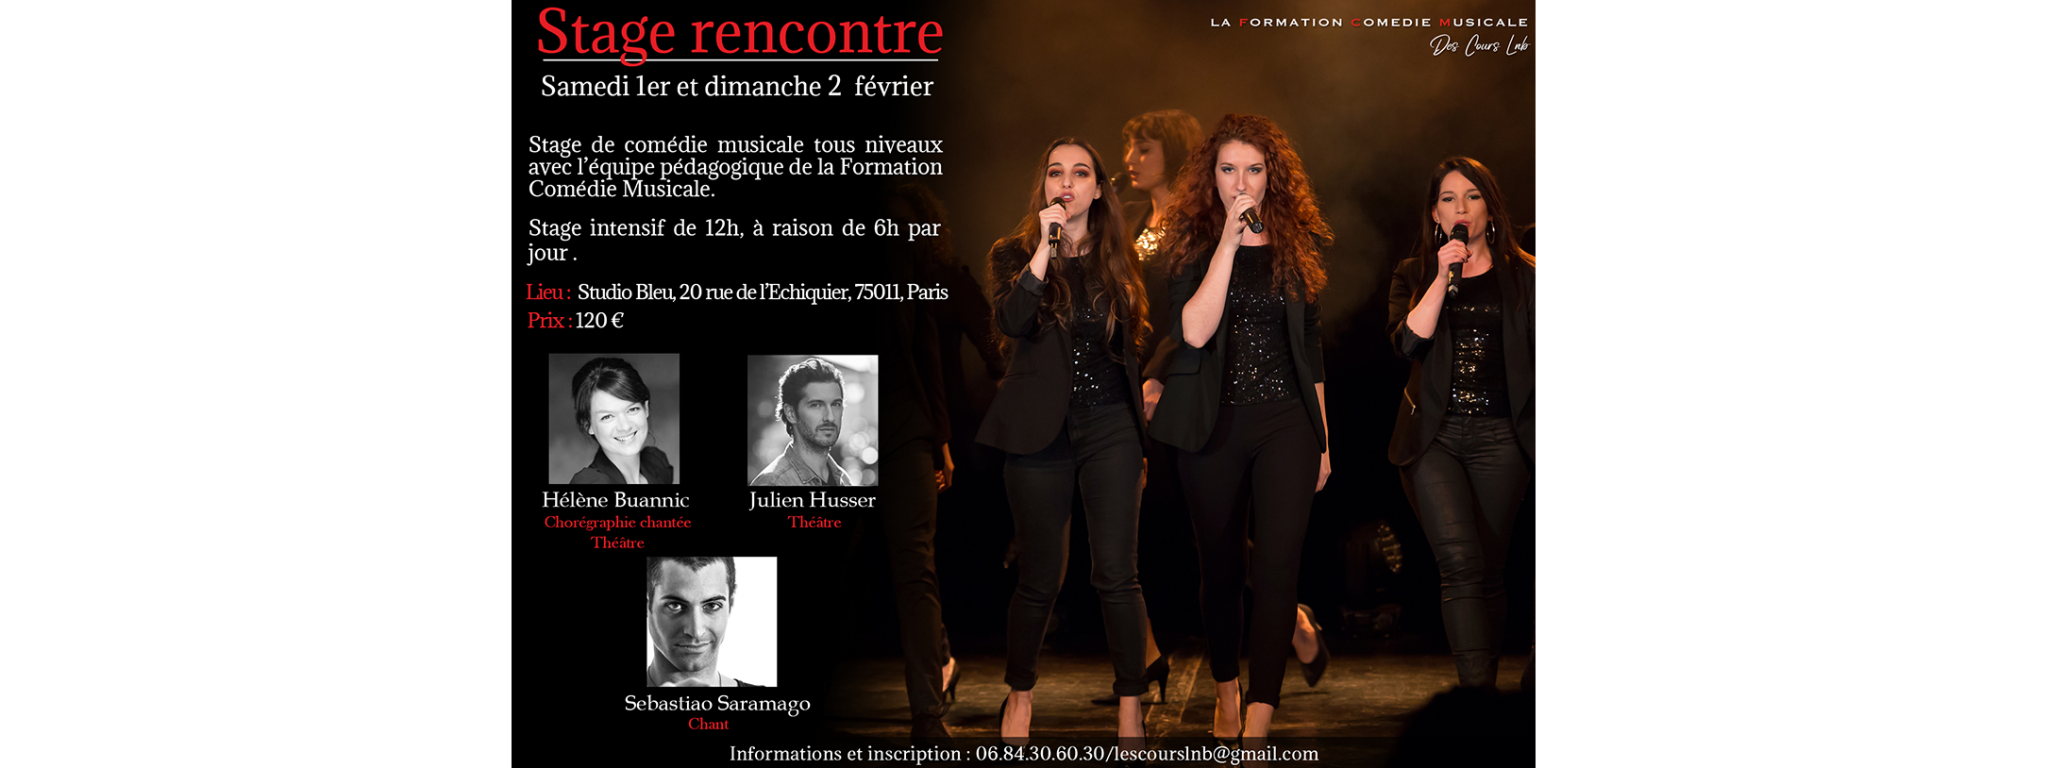 Stage rencontre Janvier 2019